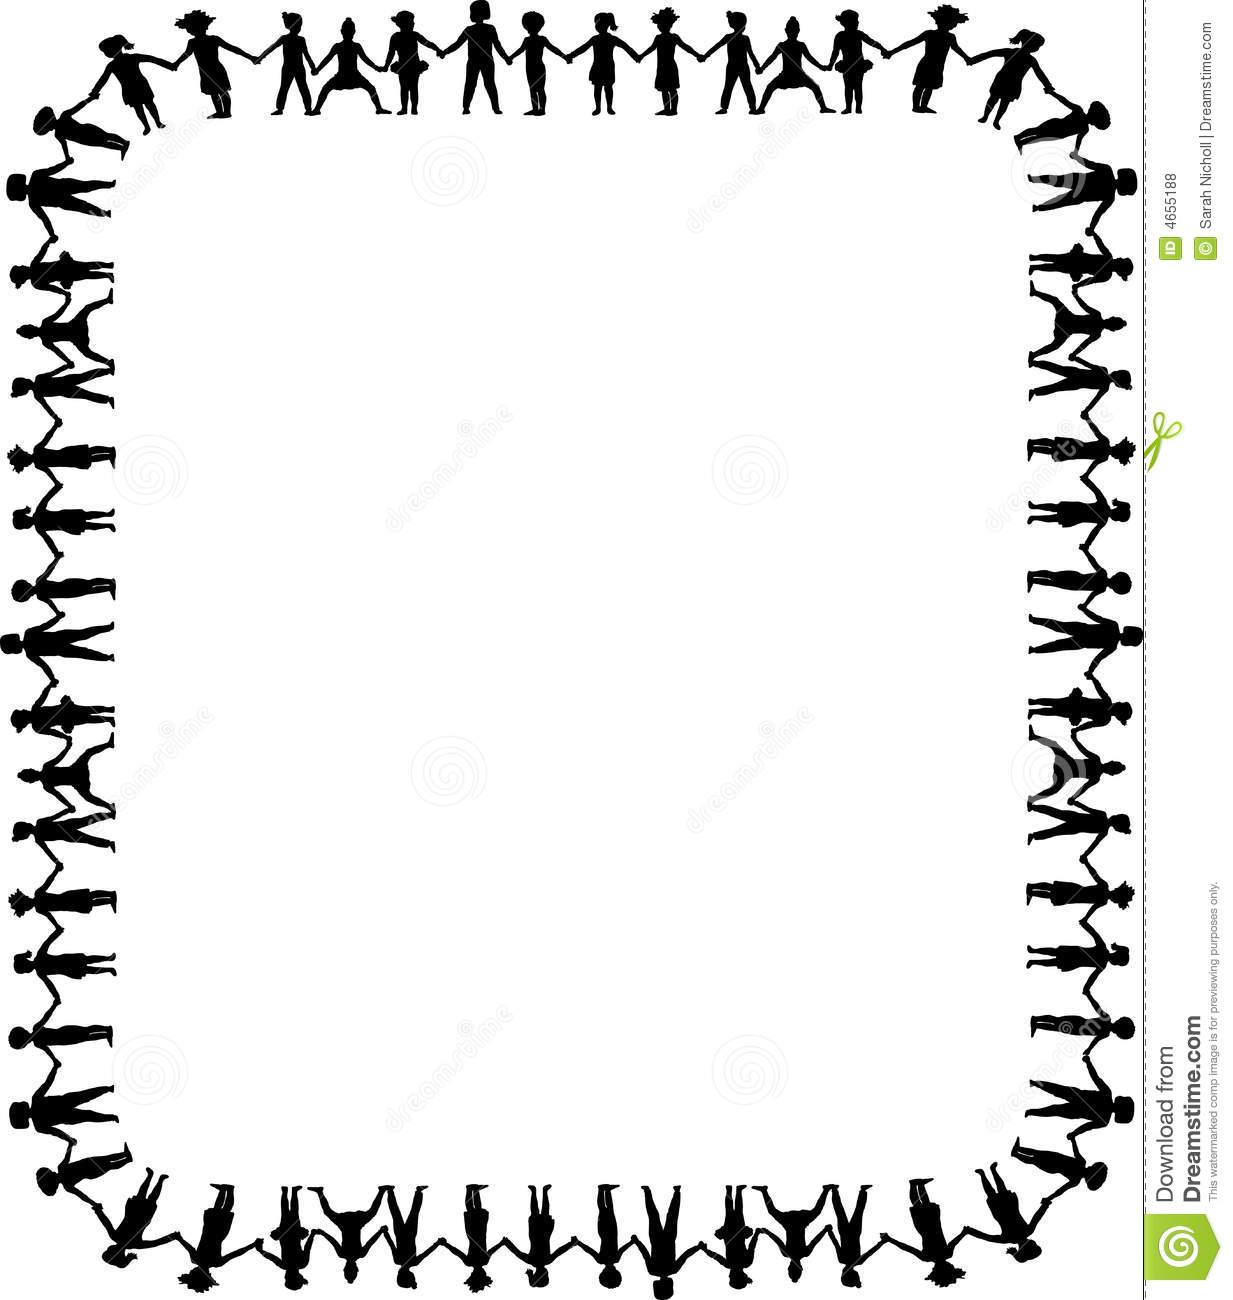 People border clipart jpg freeuse stock People clipart border - ClipartFest jpg freeuse stock